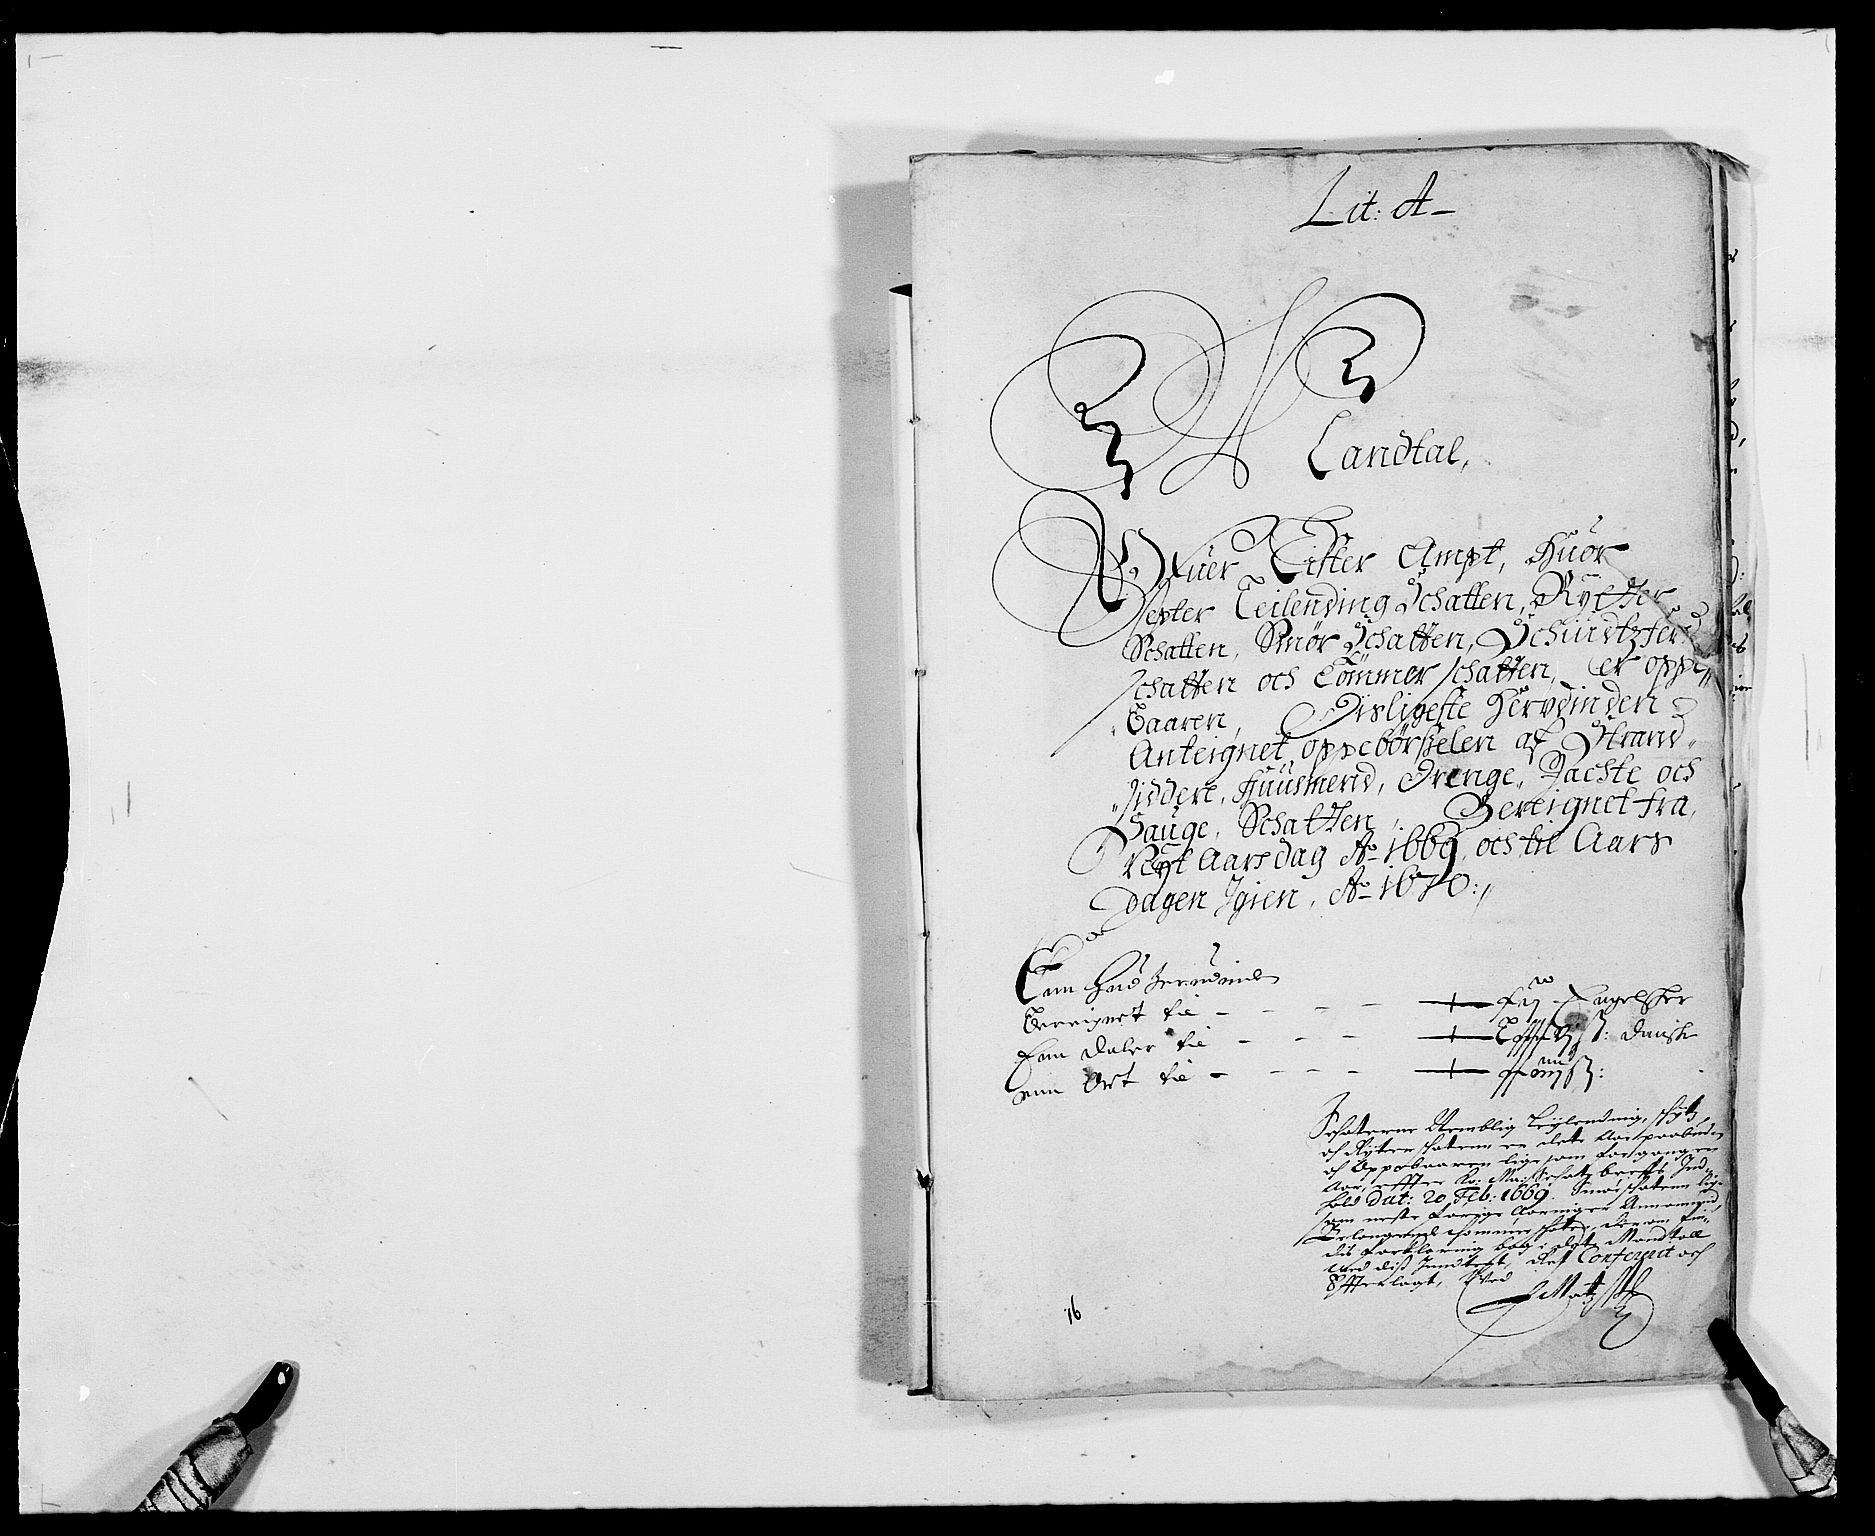 RA, Rentekammeret inntil 1814, Reviderte regnskaper, Fogderegnskap, R41/L2525: Fogderegnskap Lista, 1669-1671, s. 7